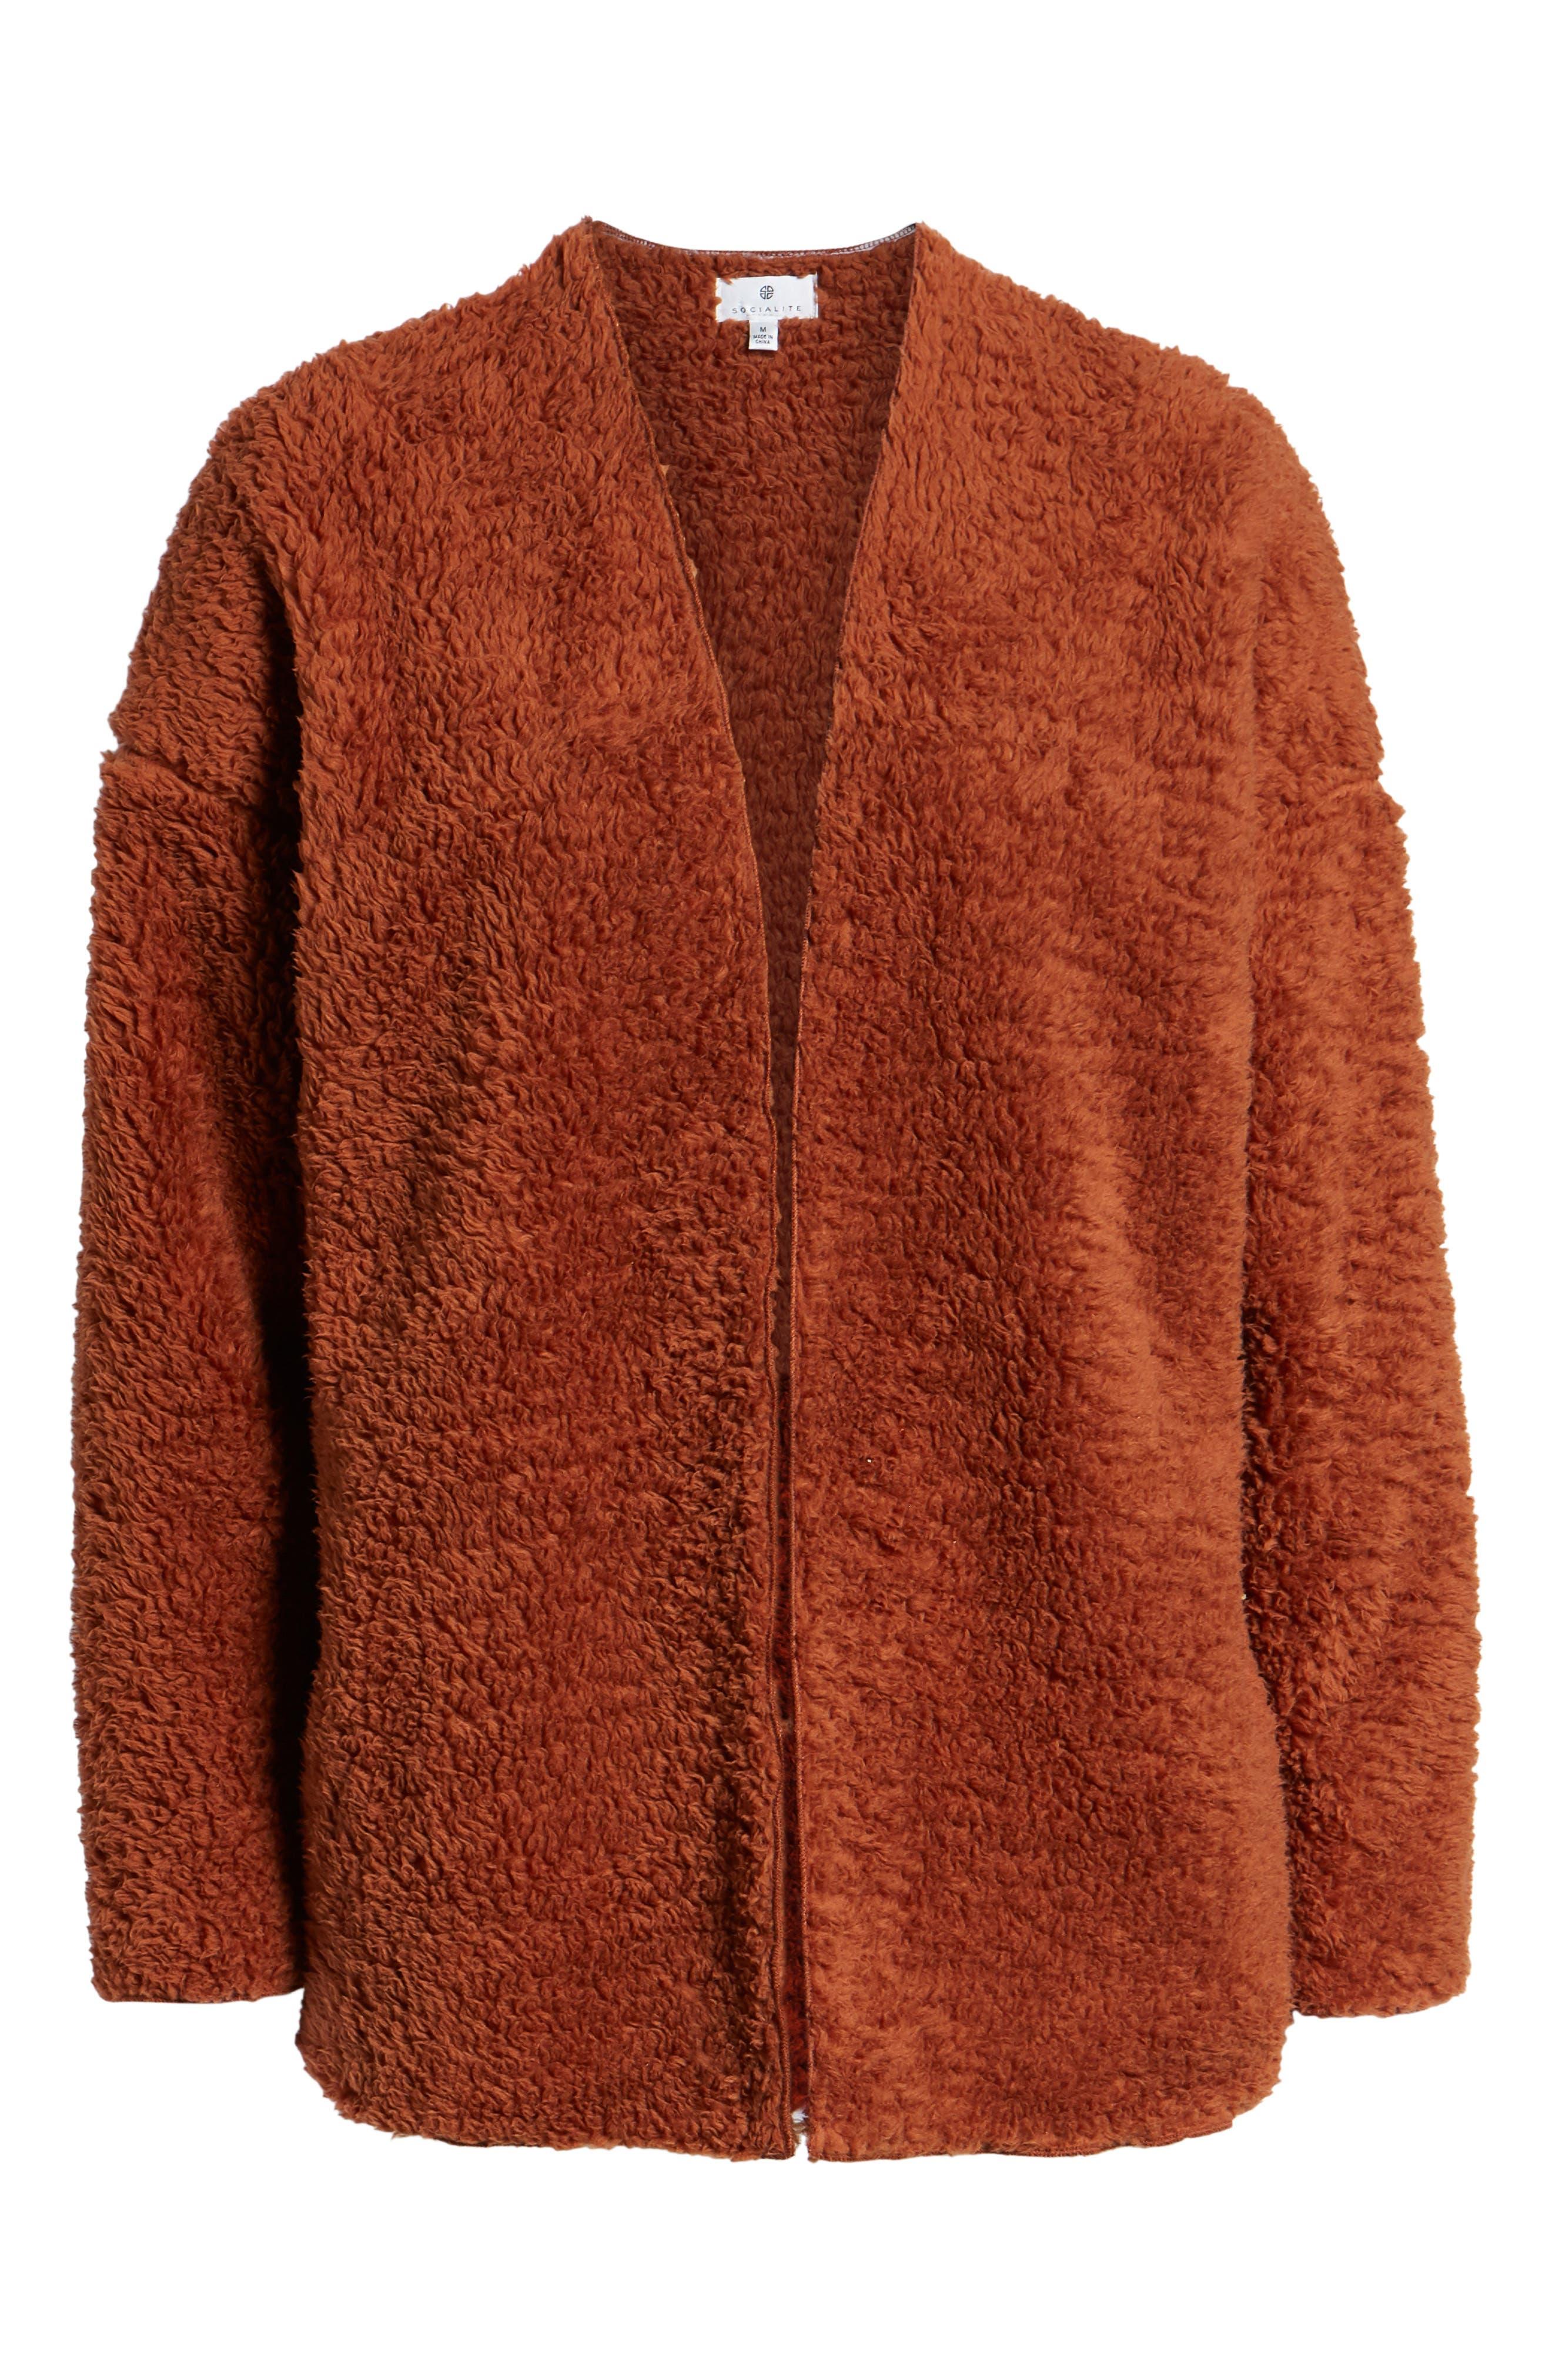 SOCIALITE, Cozy High Pile Fleece Jacket, Alternate thumbnail 6, color, 200